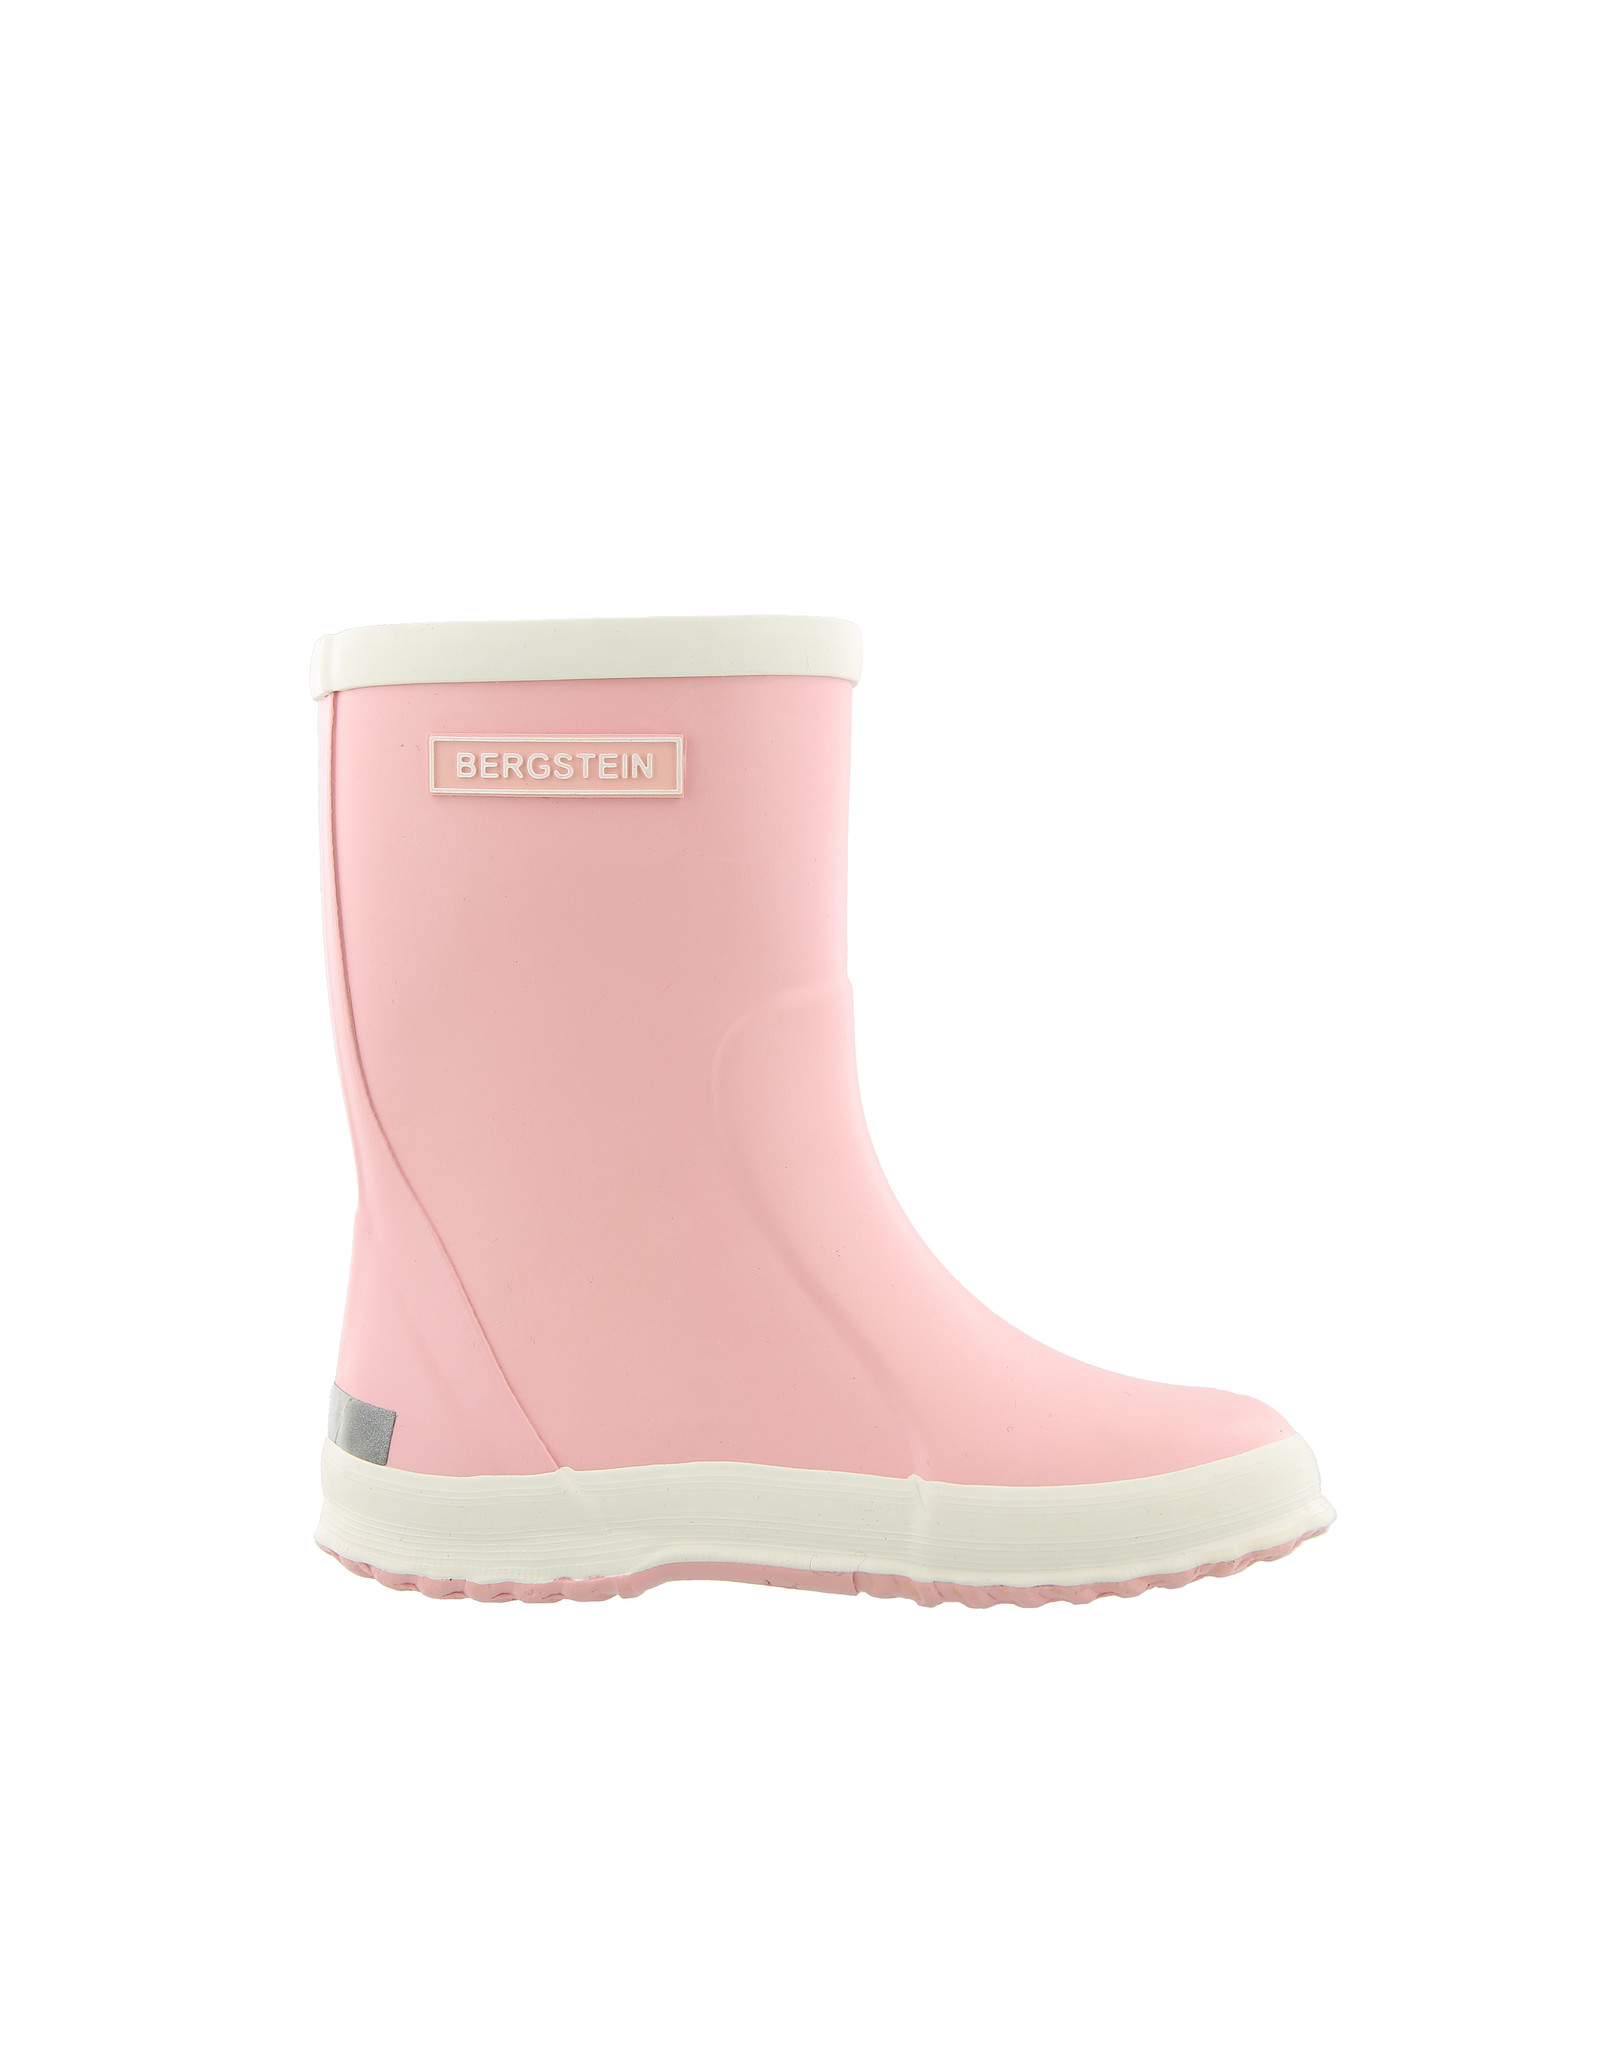 Bergstein Bergstein Regenlaars Soft Pink